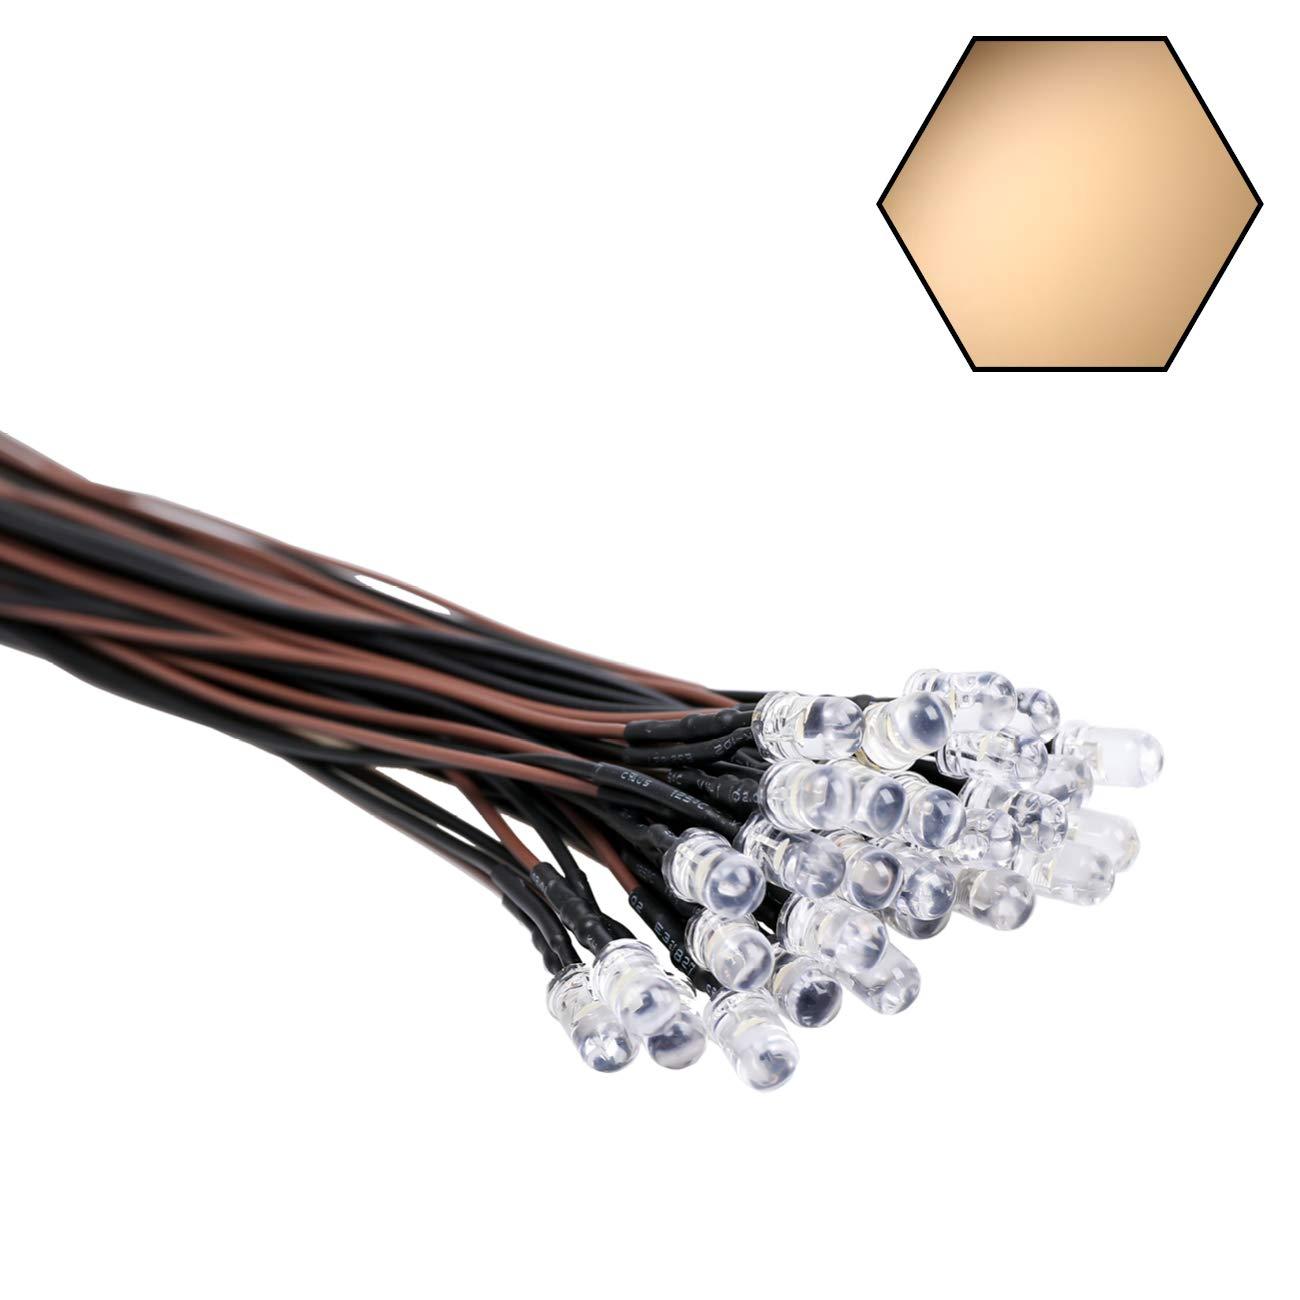 EDGELEC 30pcs 12 Volt 5mm Warm White LED Lights Emitting Diodes Pre Wired 7.9 inch DC 12v LED Light Clear Lens Small LED Lamps